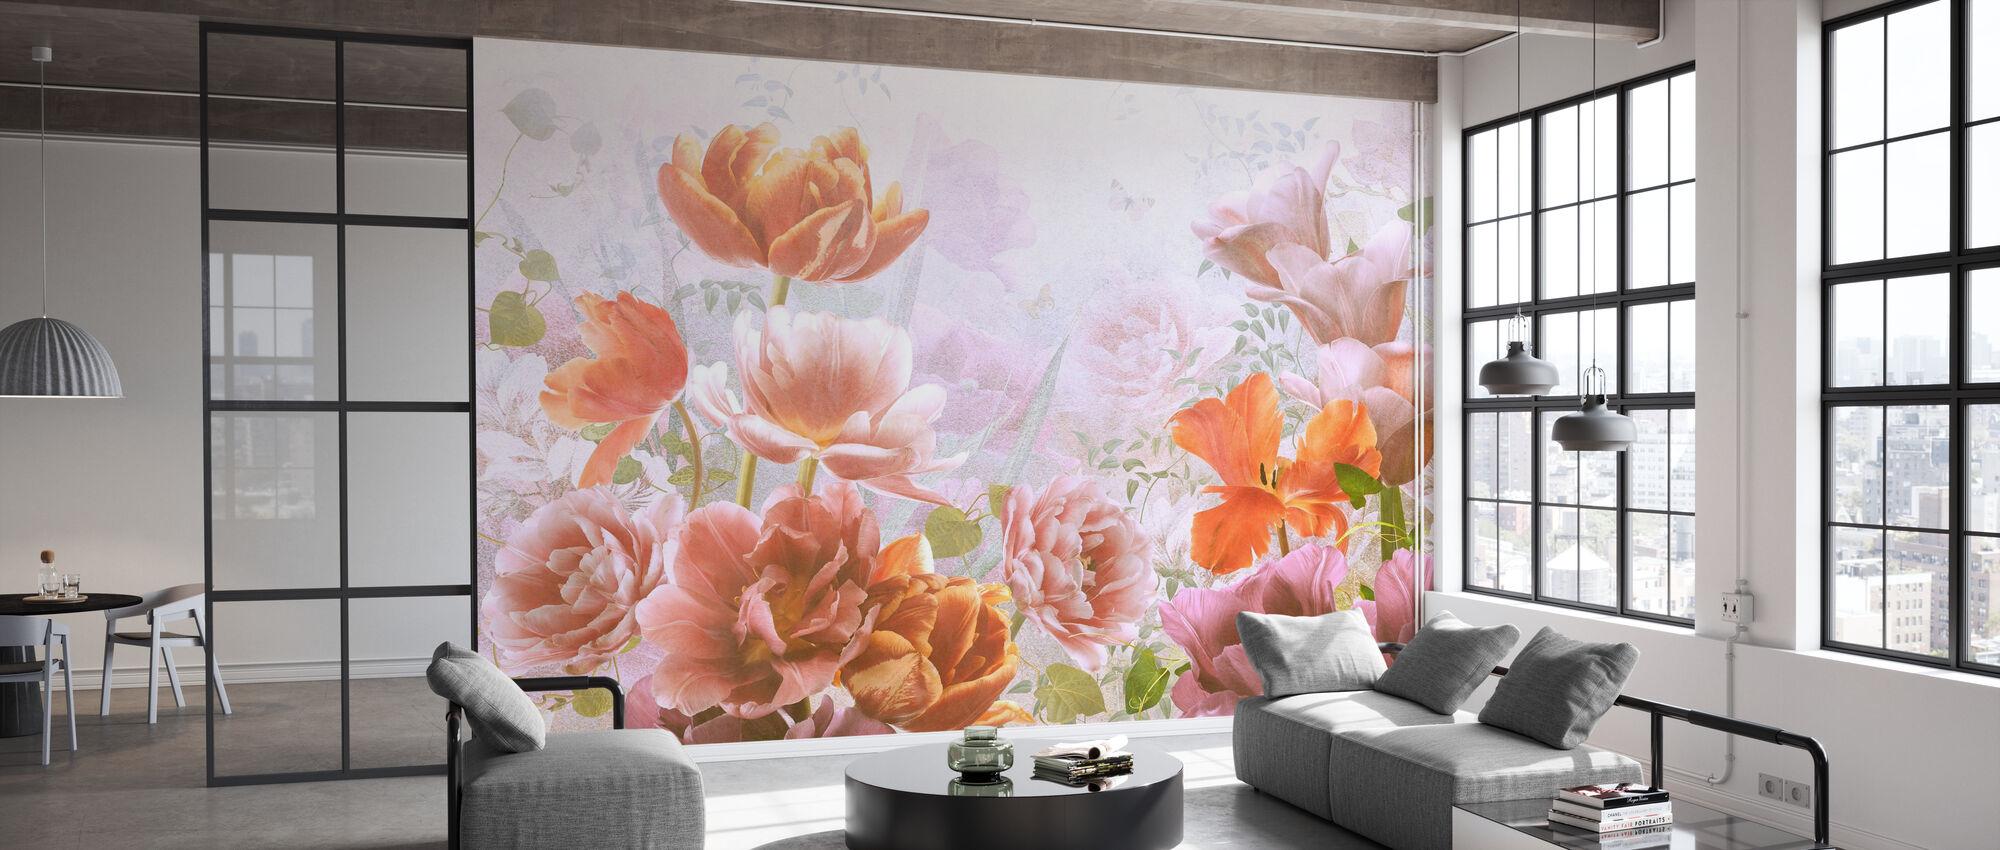 Floralness - Wallpaper - Office